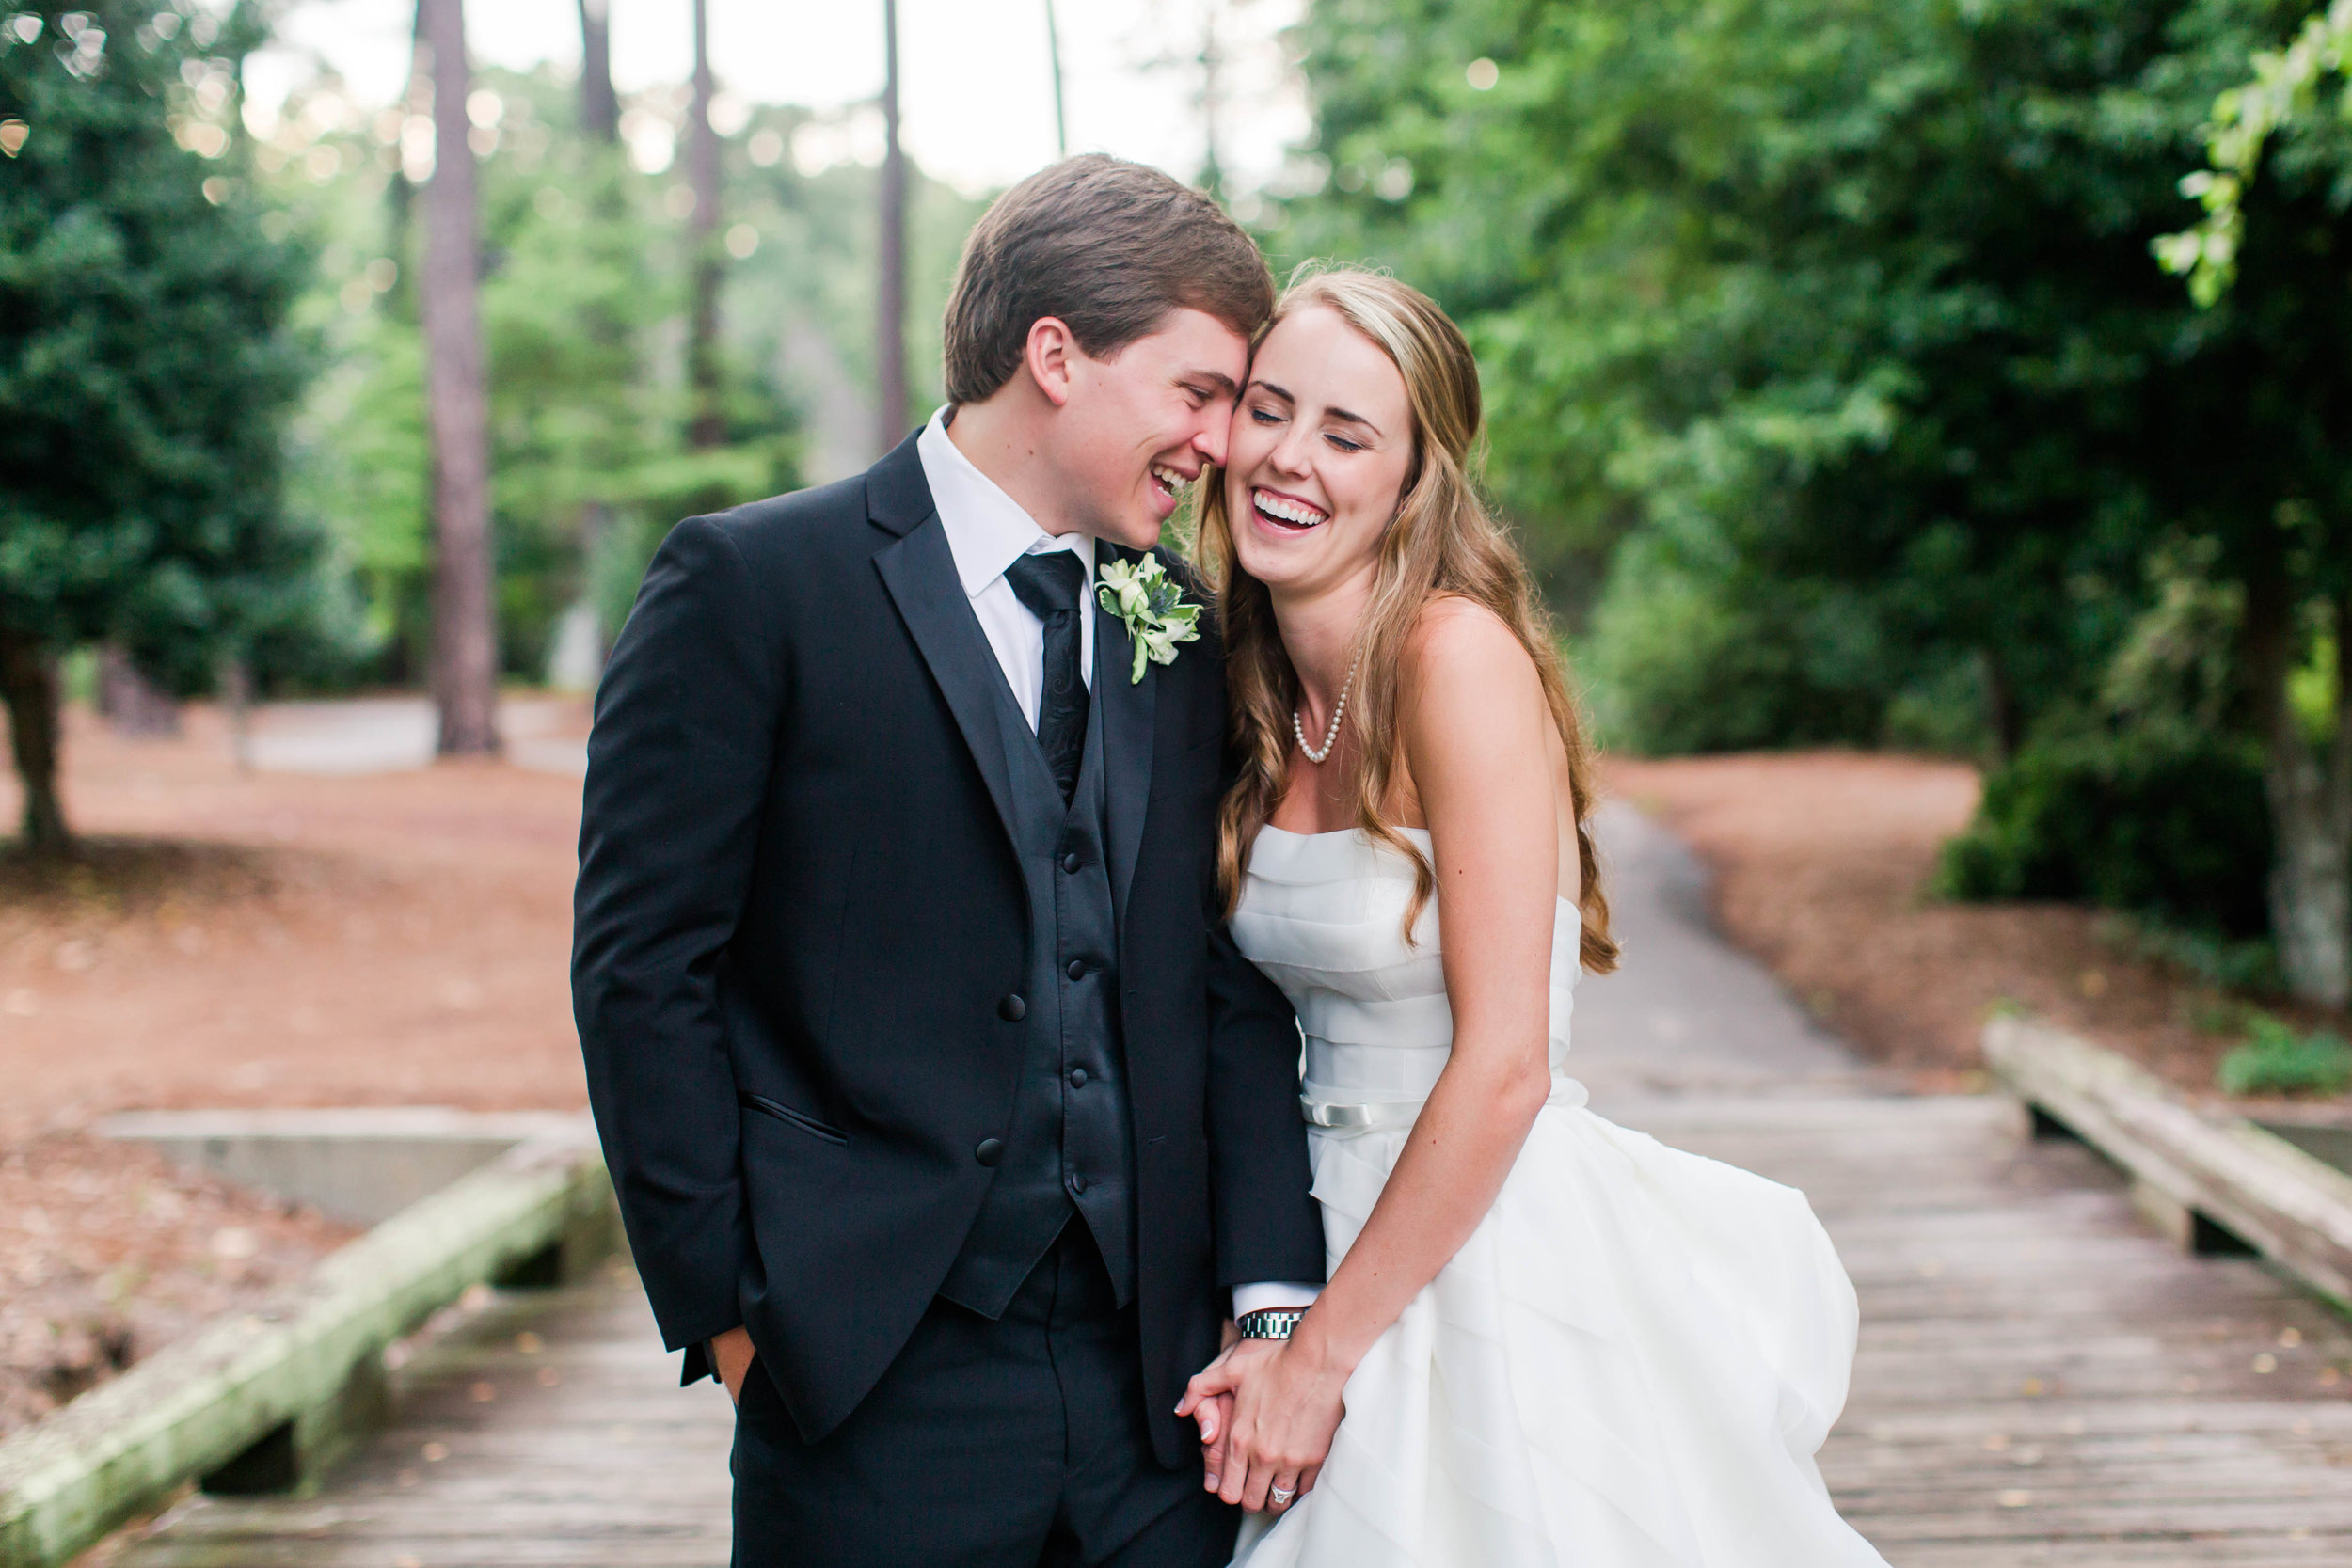 Stone_Bride and Groom_170.jpg